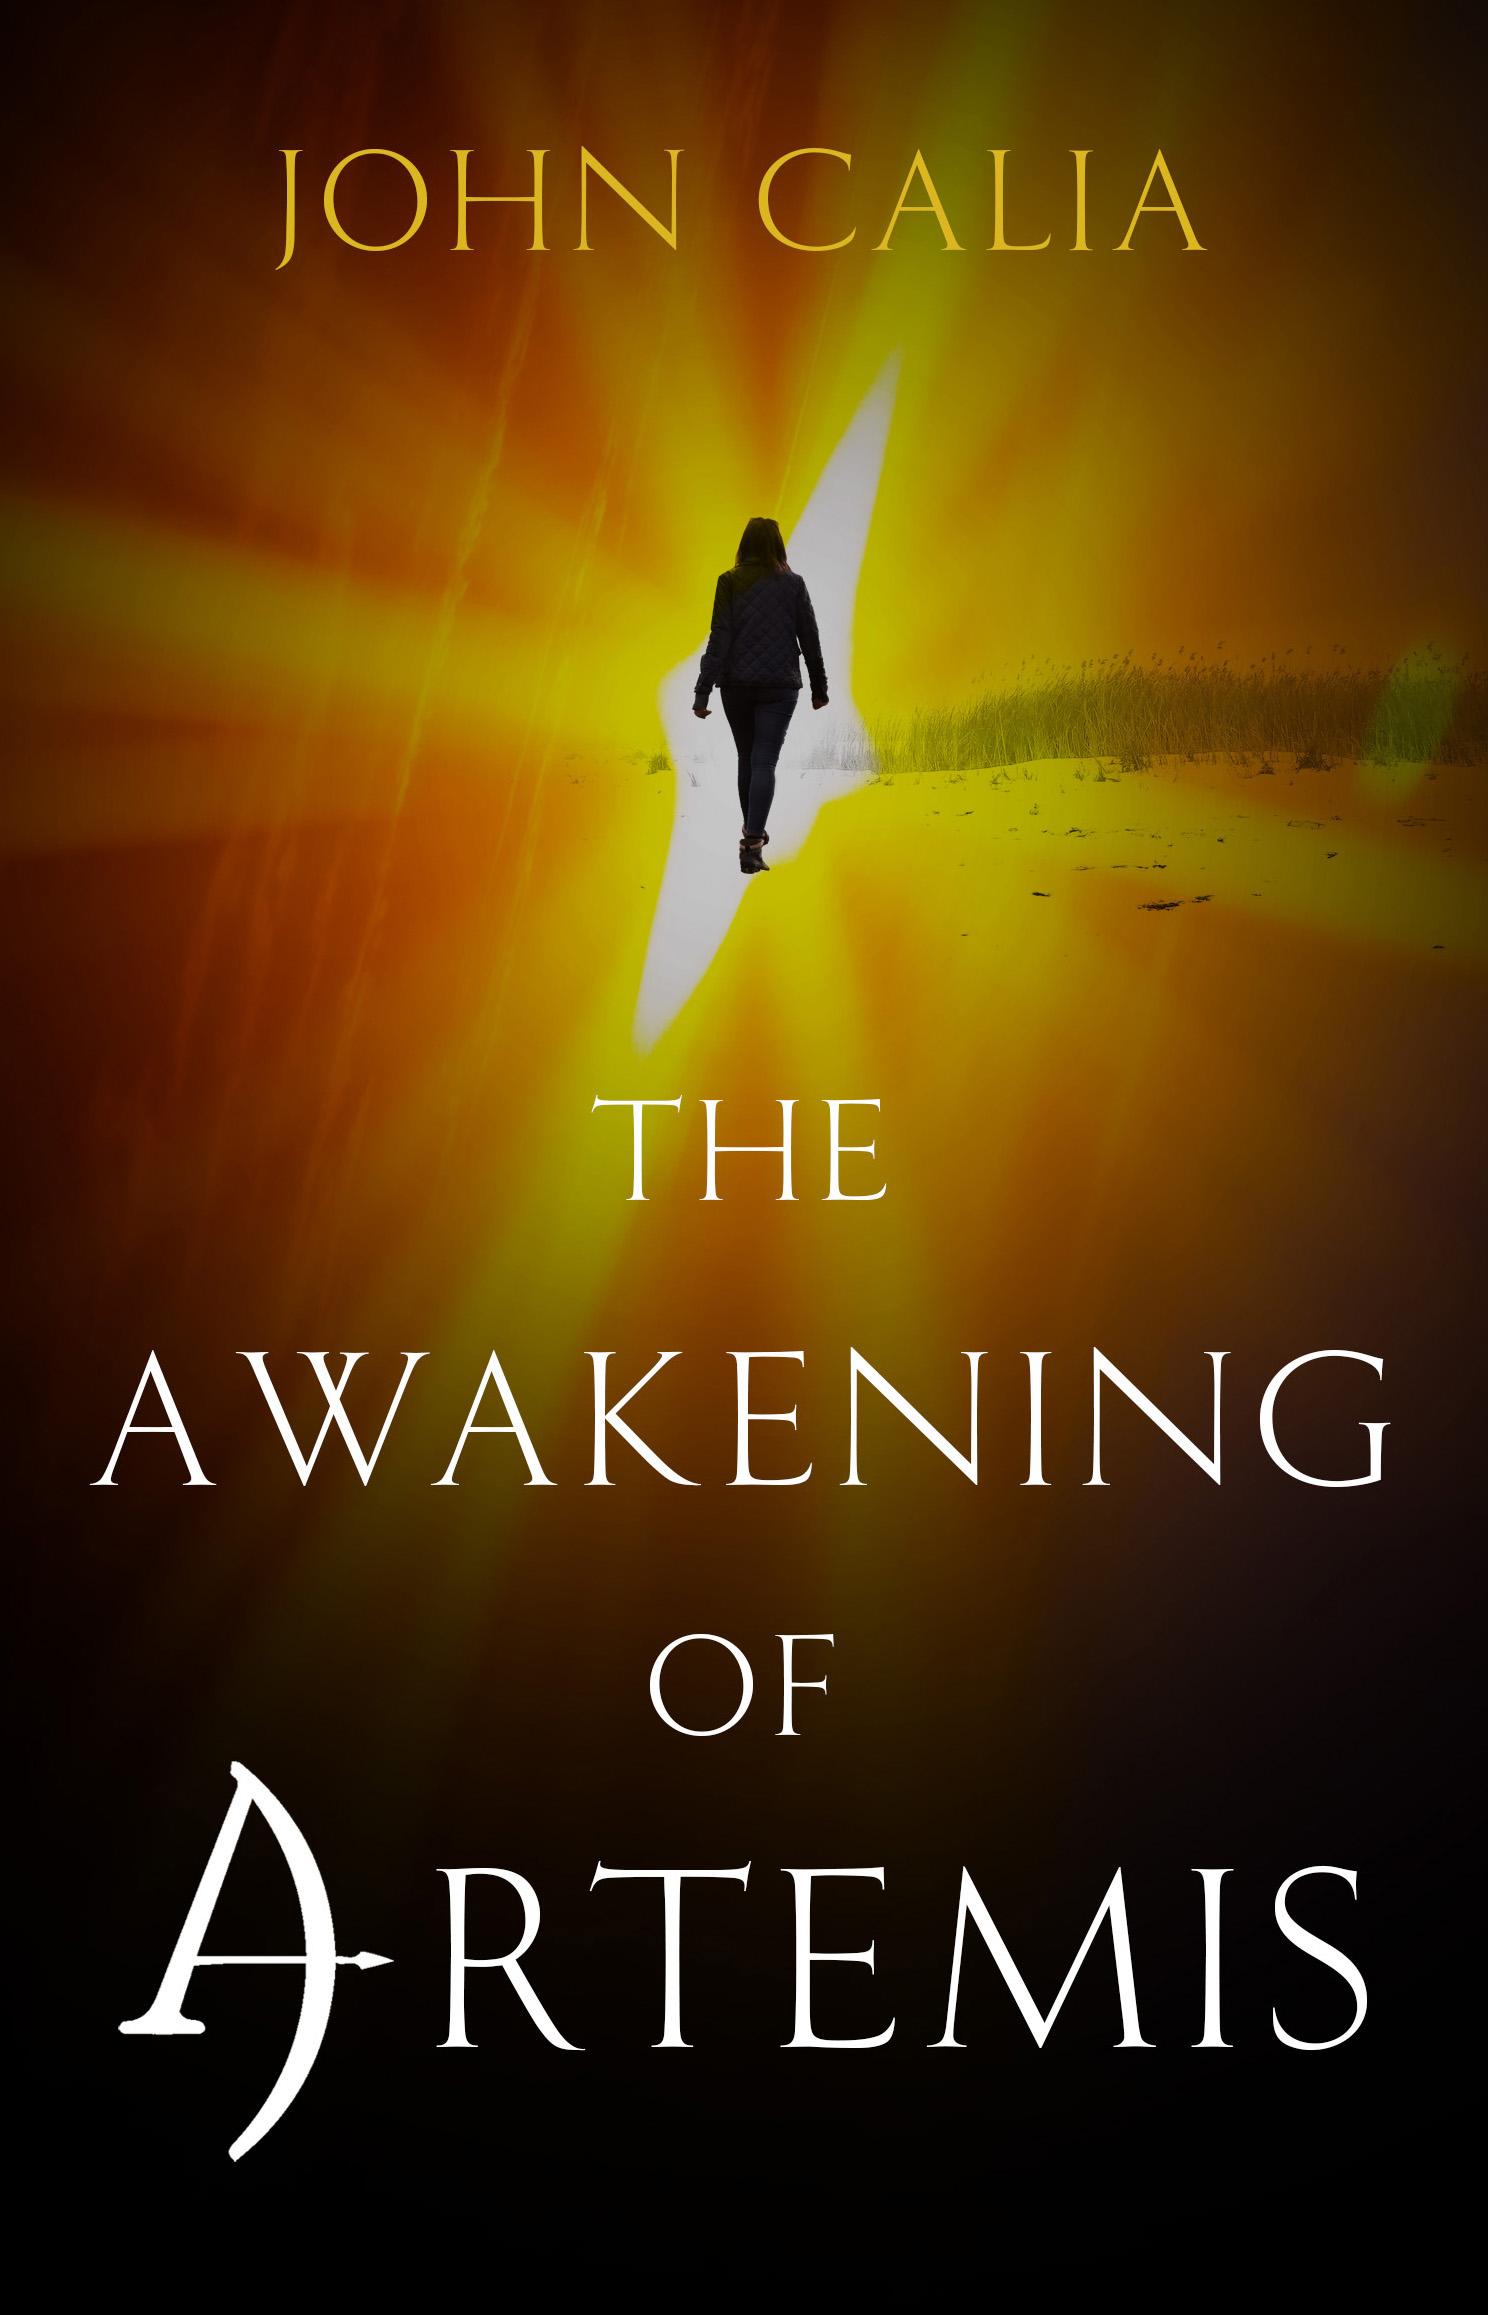 THE_AWAKENING_OF_ARTEMIS